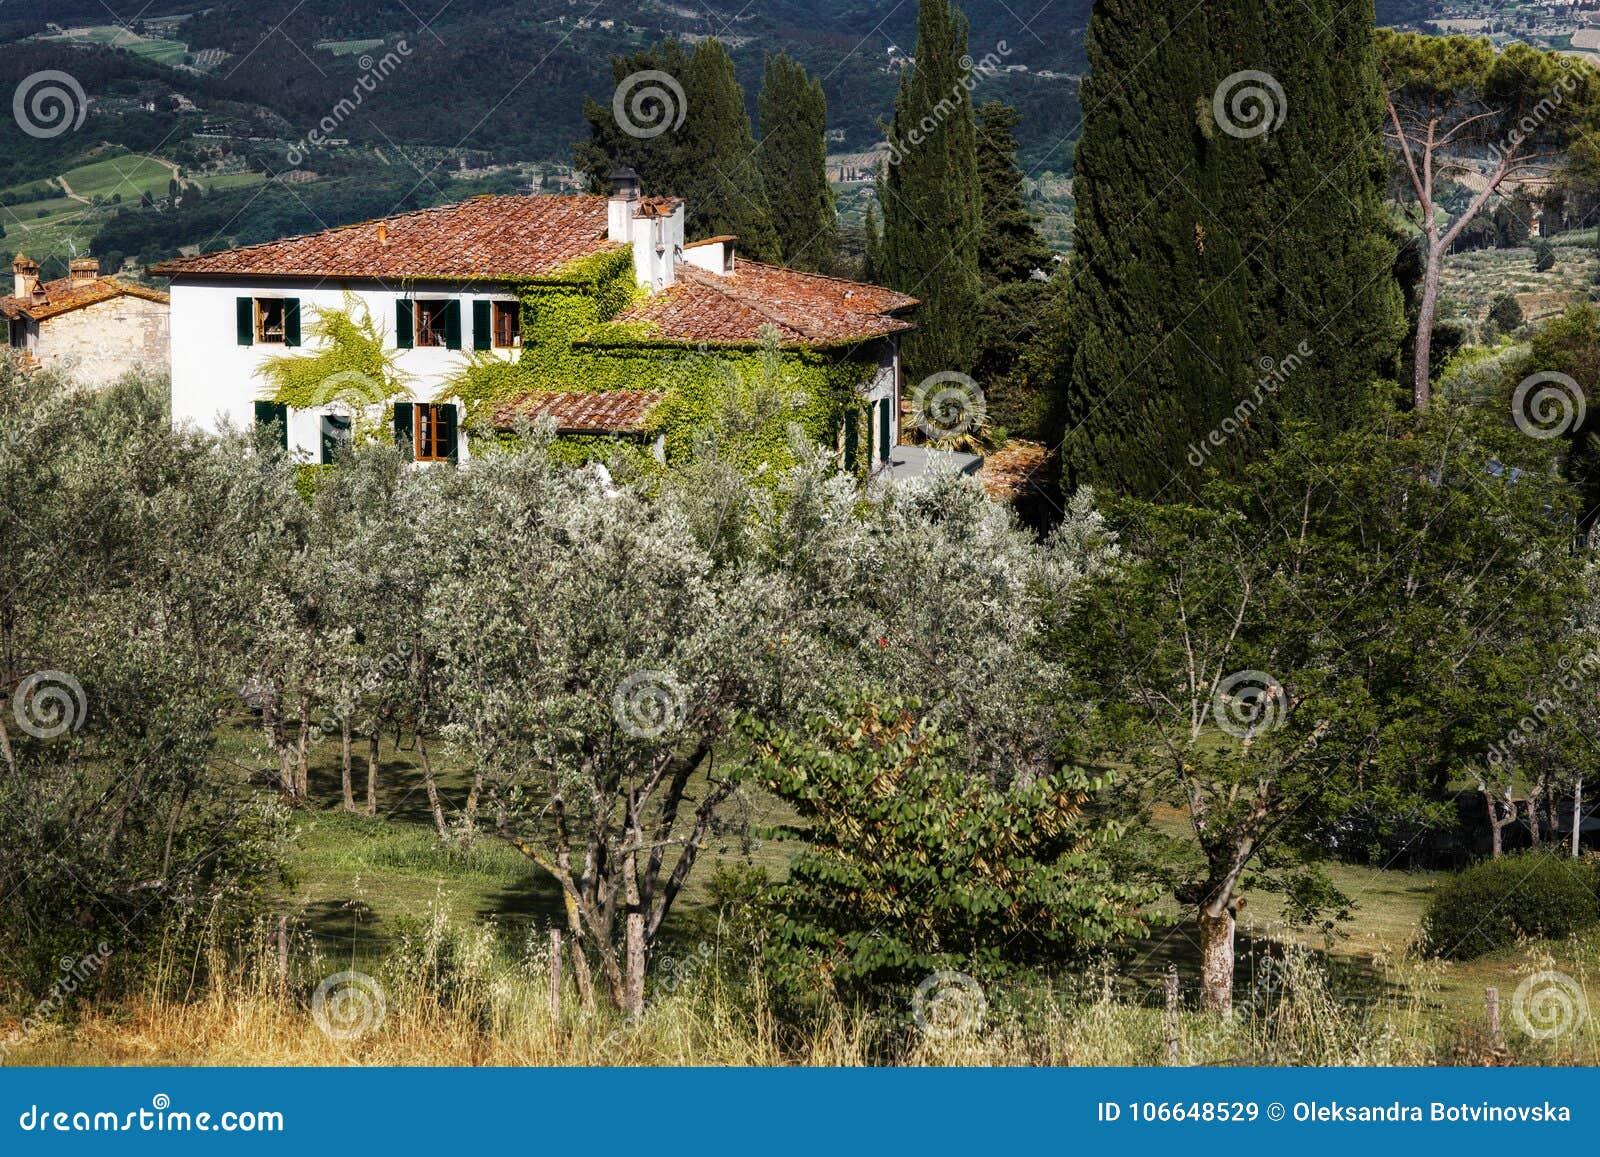 Beautiful Italian Villa In The Green Garden Stock Image - Image of ...